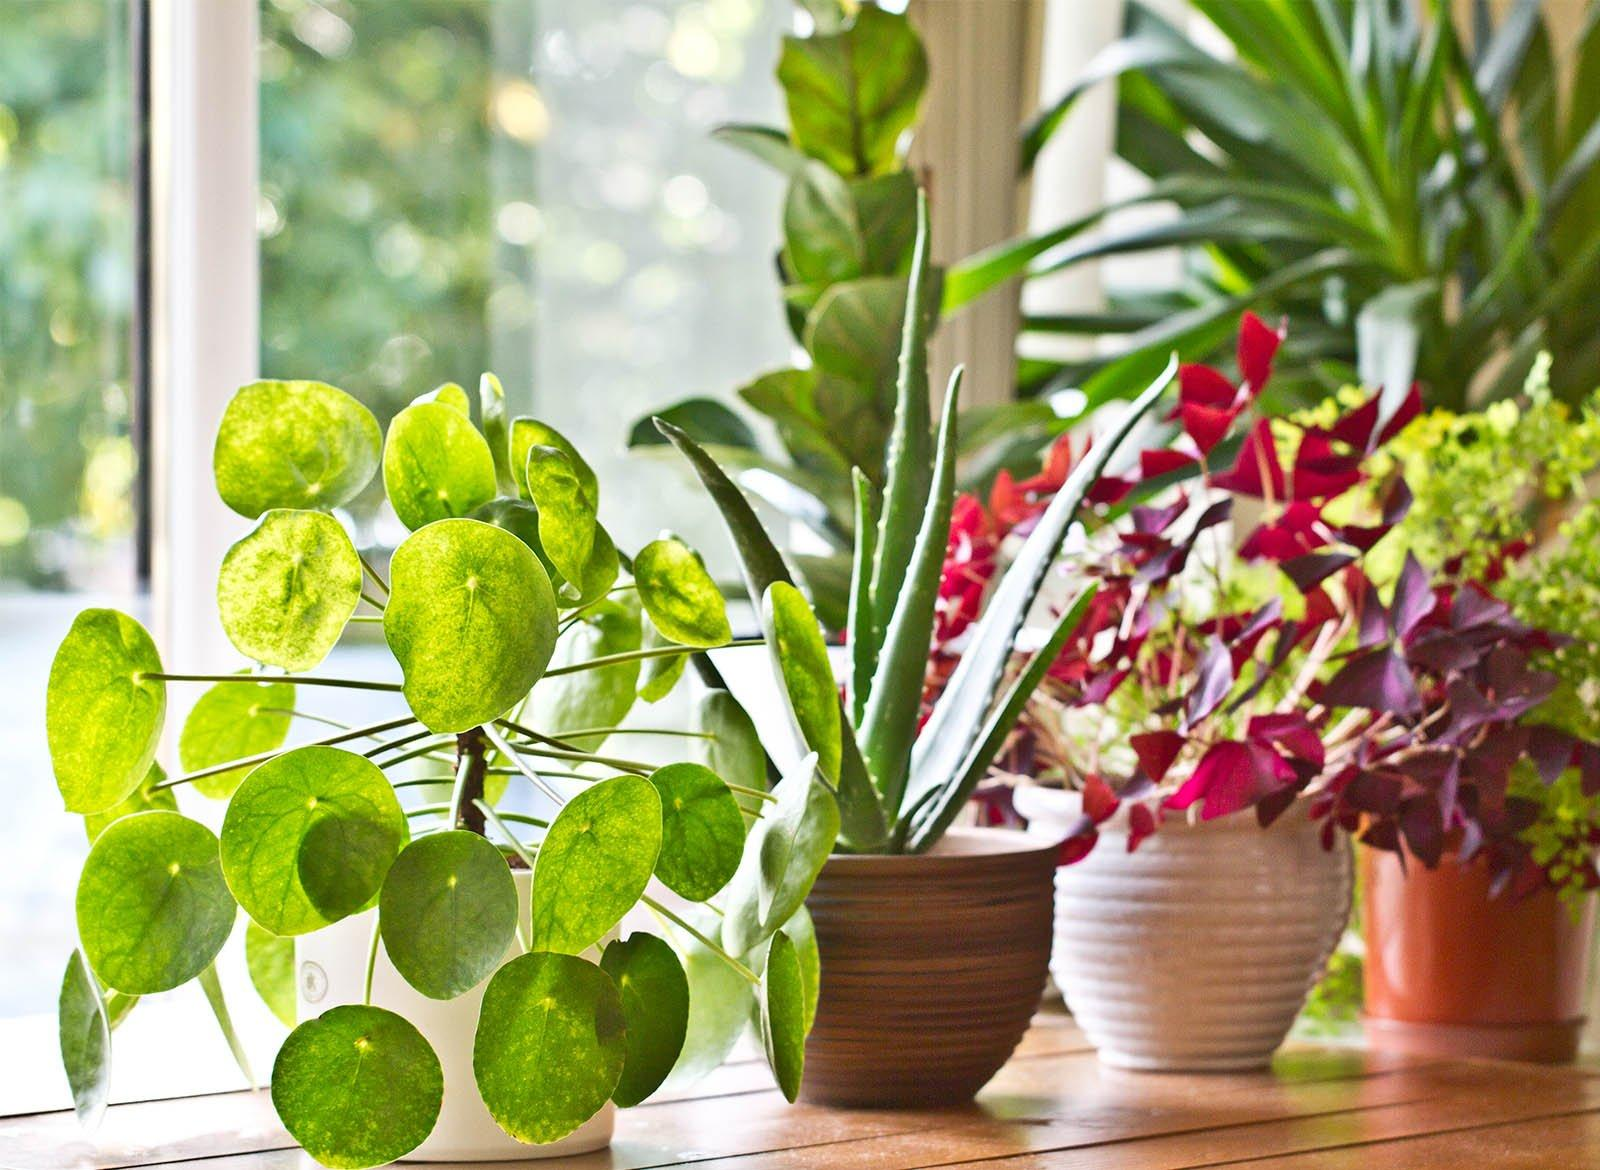 https://ofigeno.ru/wp-content/uploads/2020/06/spring_plants_cover_2048x.jpg